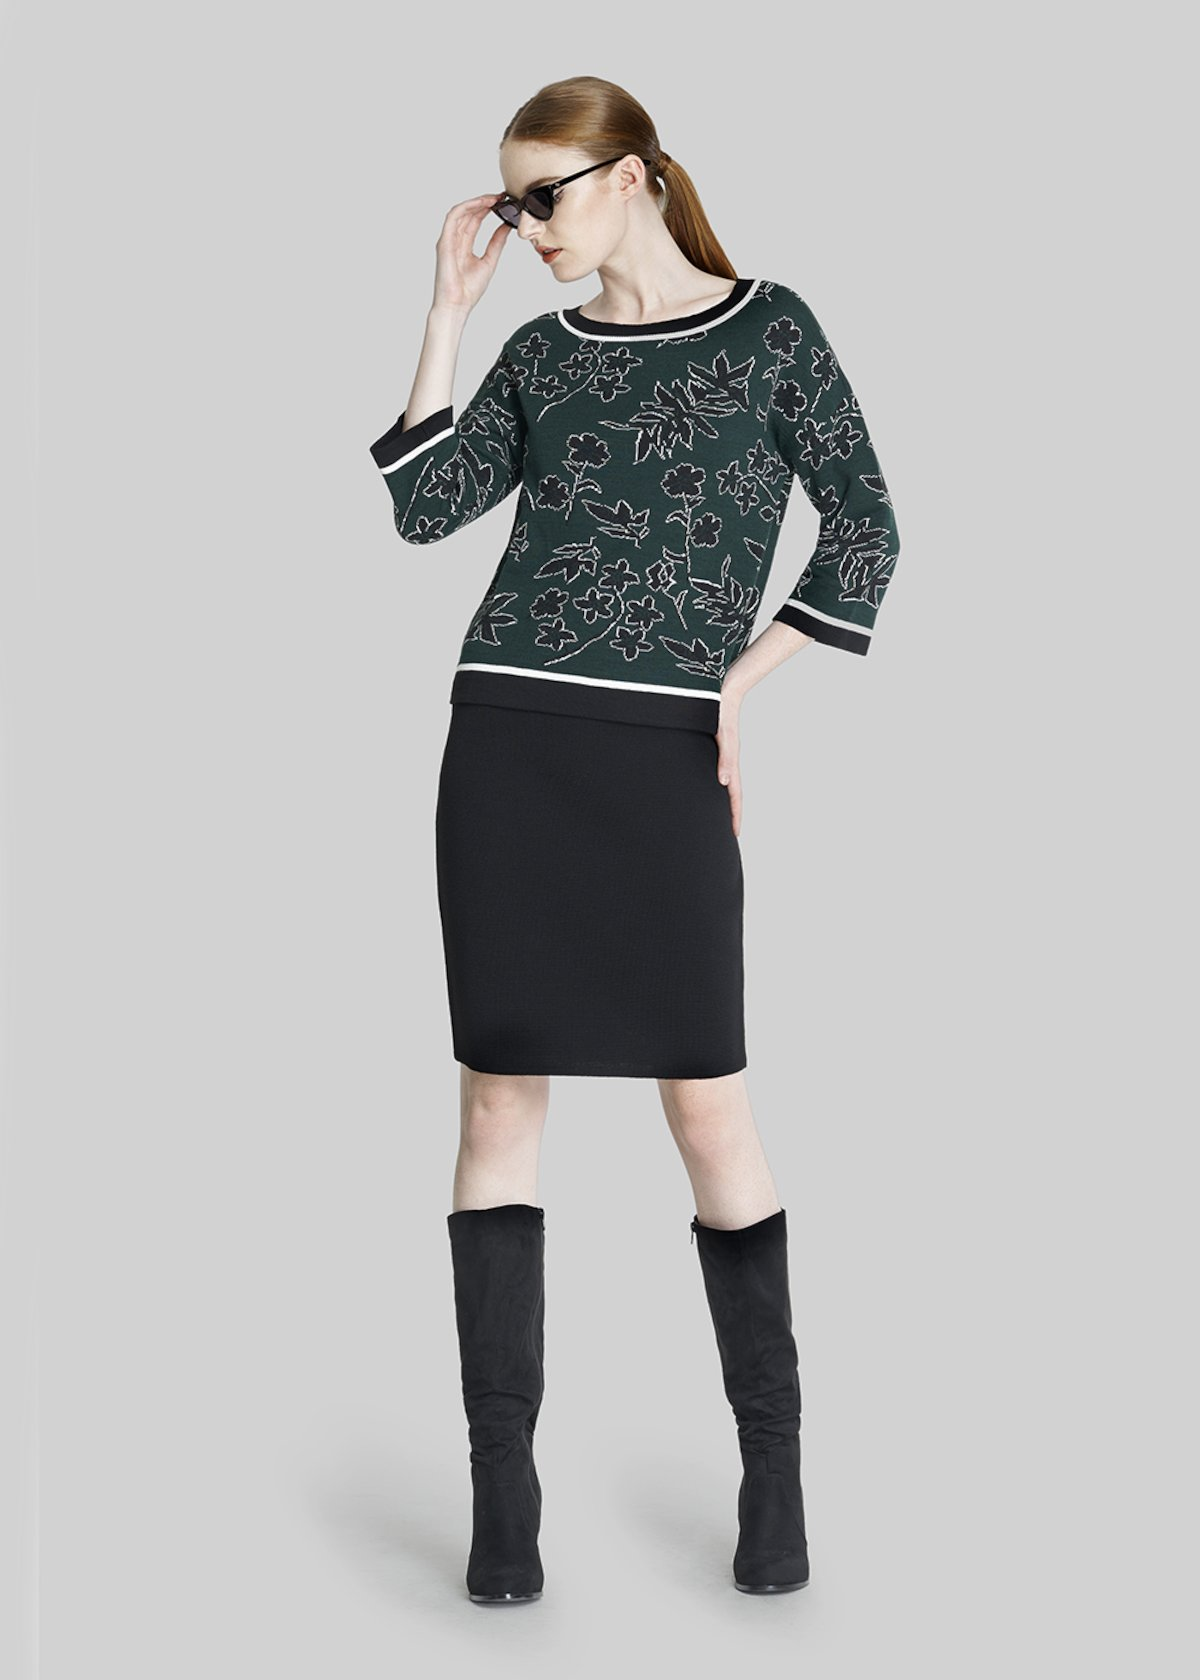 Mady 3/4 sleeve sweater - Pino / Black / Fantasia - Woman - Category image